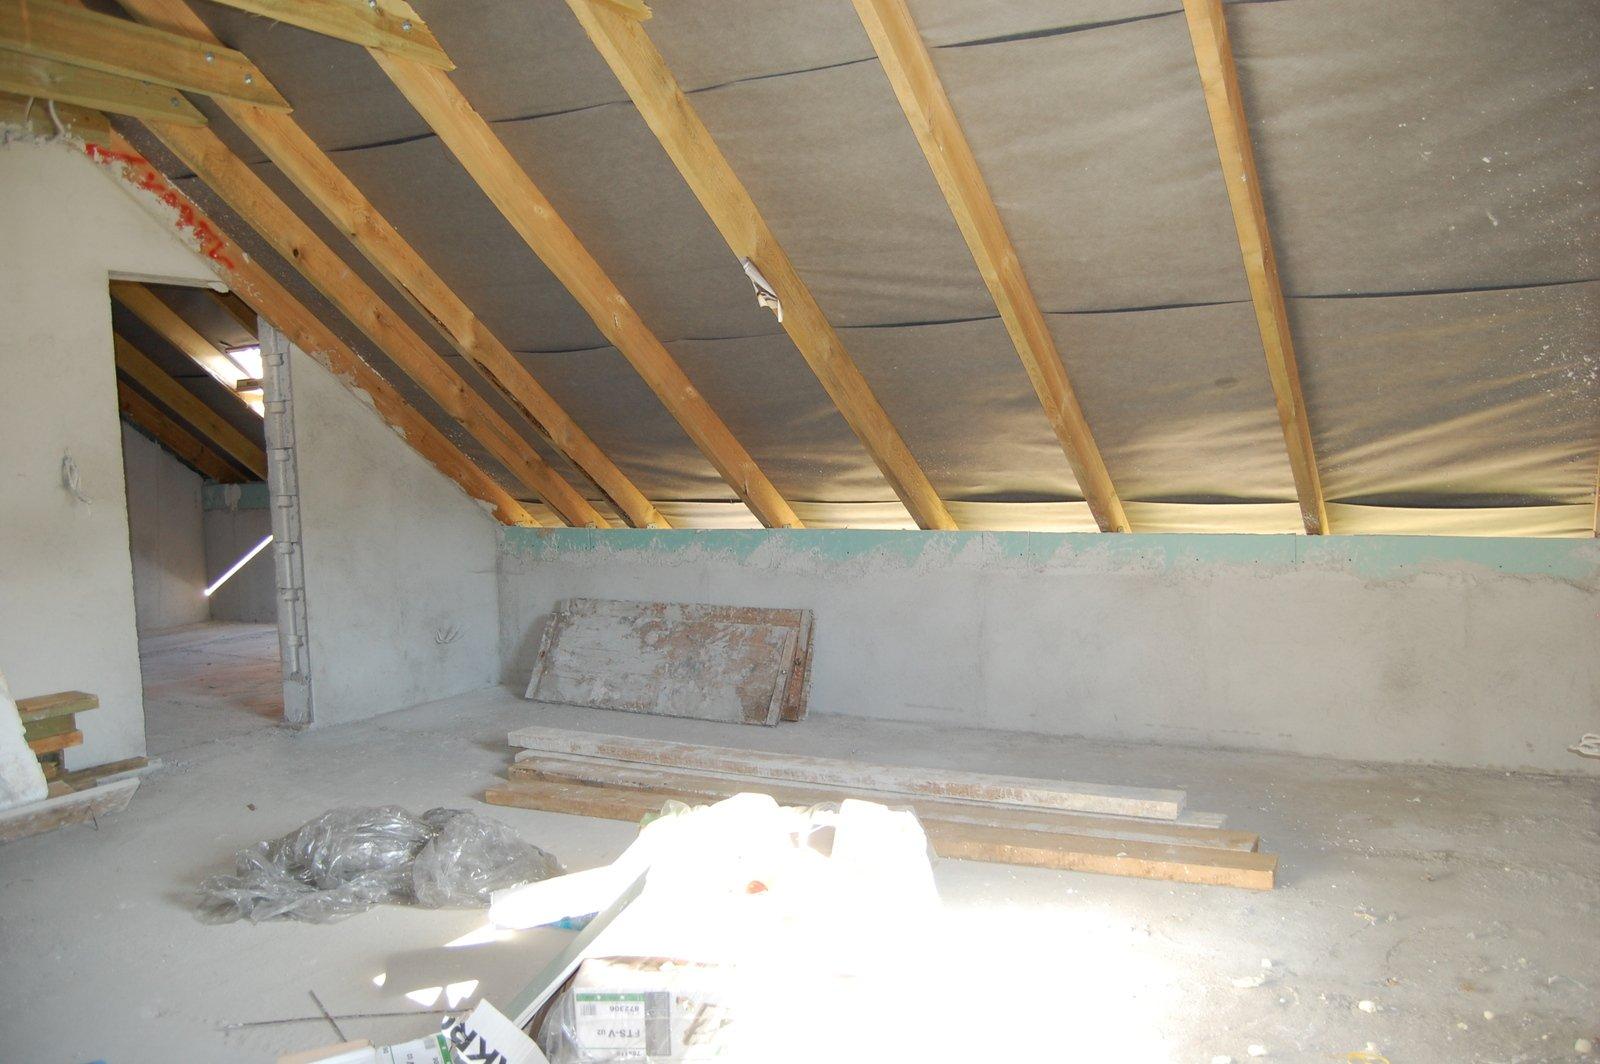 Pokój nad garażem